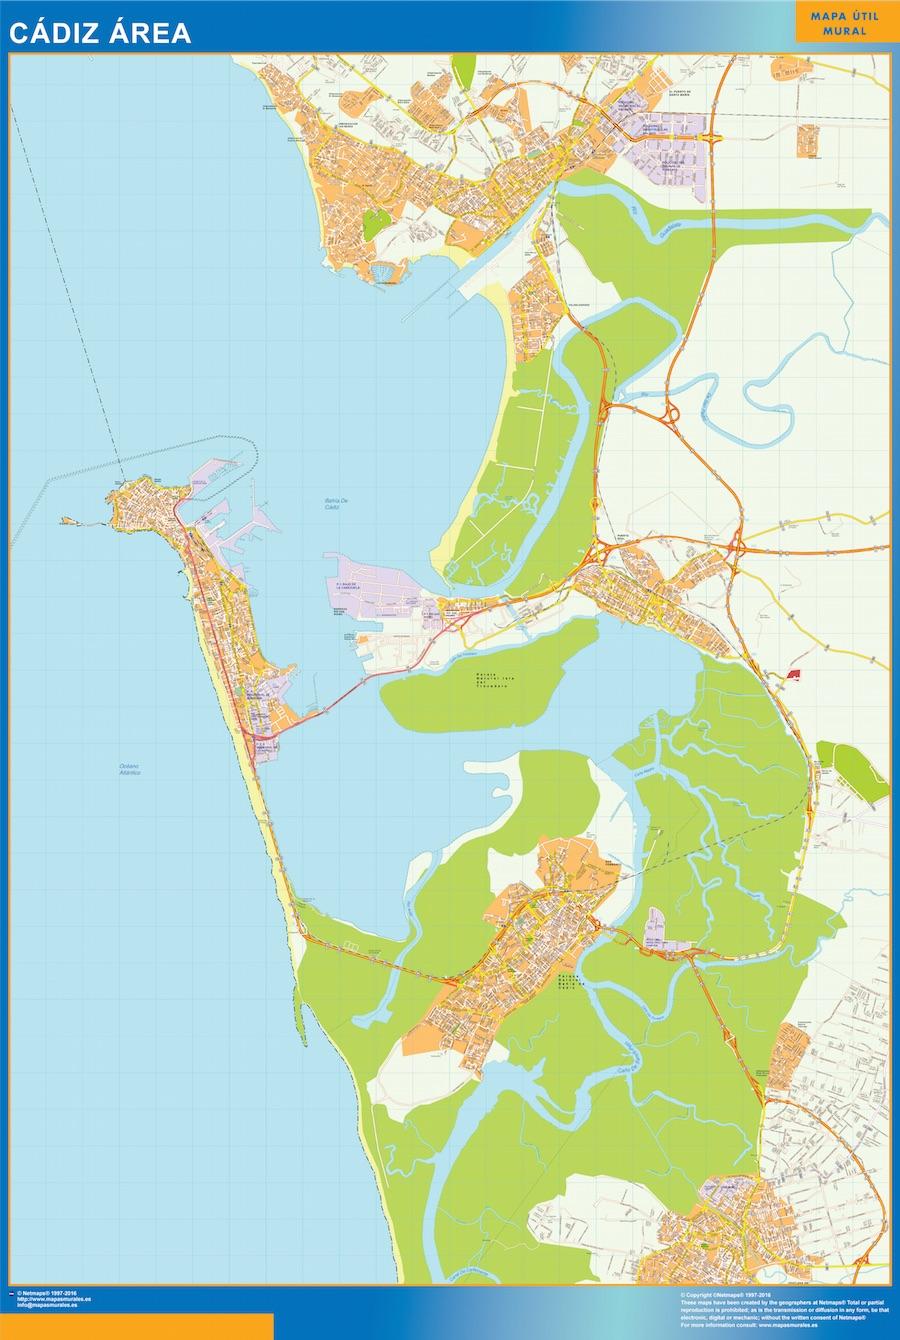 Mapa carreteras Cadiz Area plastificado gigante